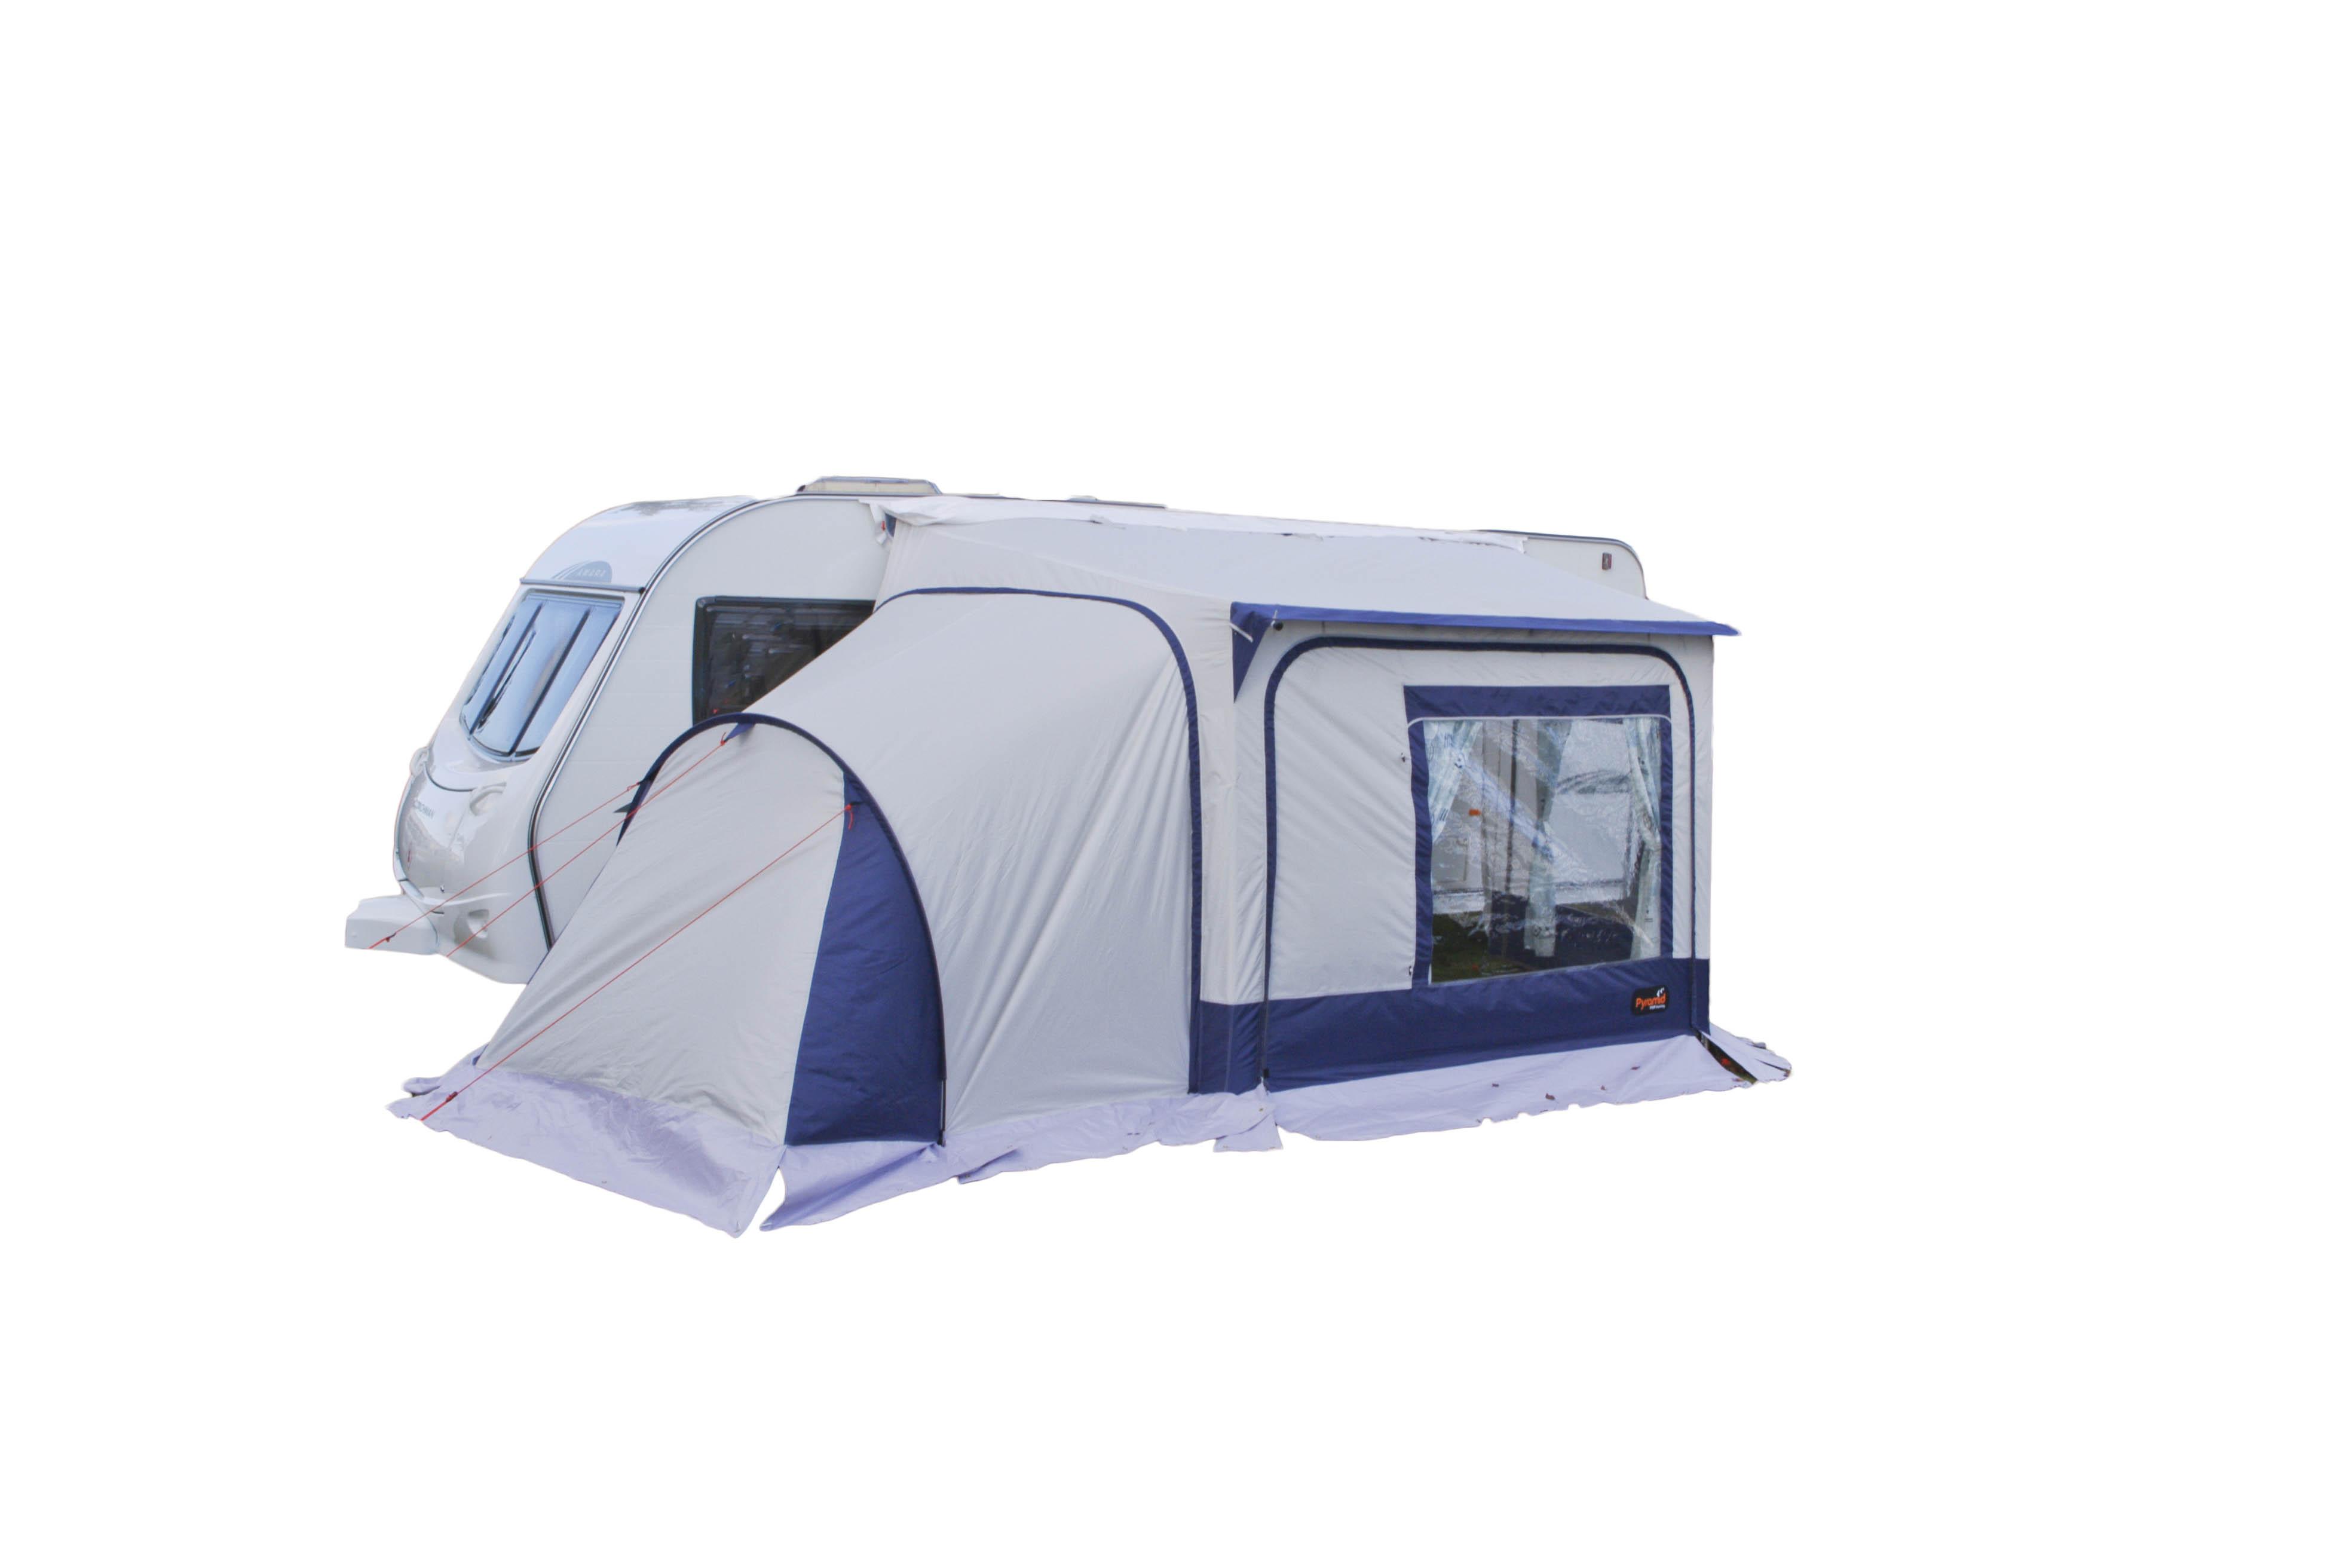 Pyramid PDQ Quick Erect Caravan Porch Awning 2011 Model   eBay